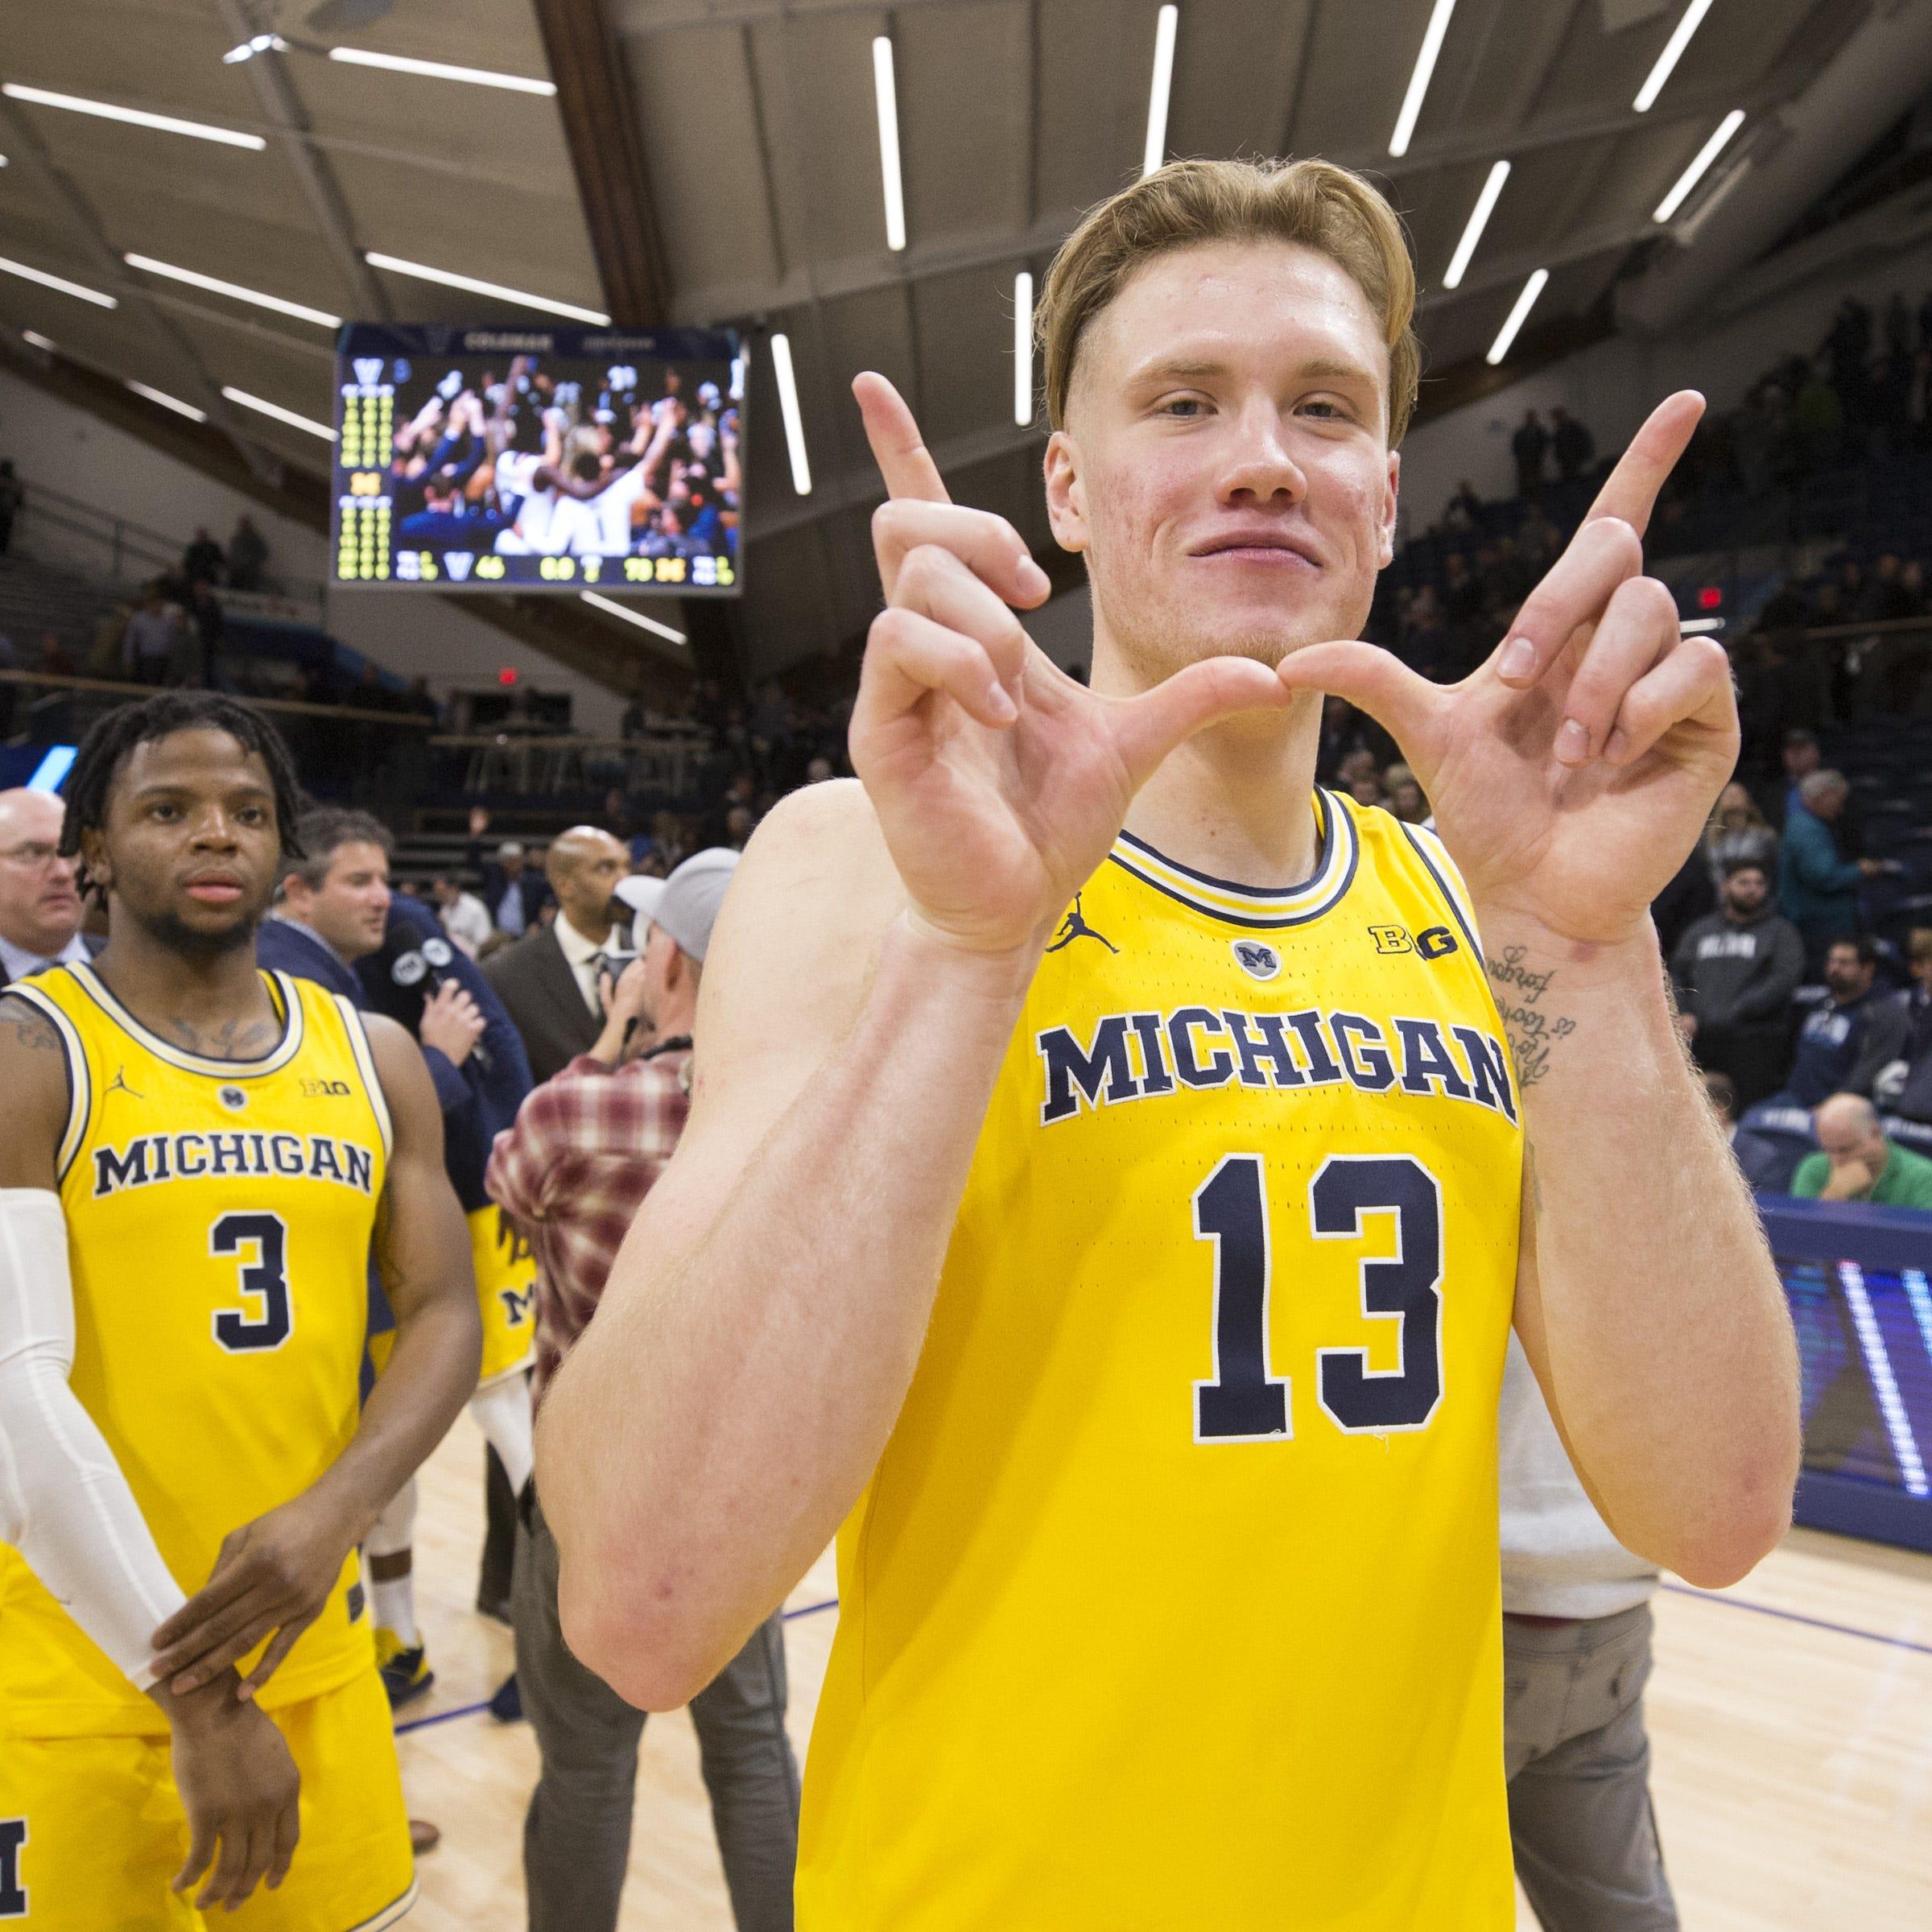 Michigan basketball looked like a juggernaut vs. Villanova. Here's why